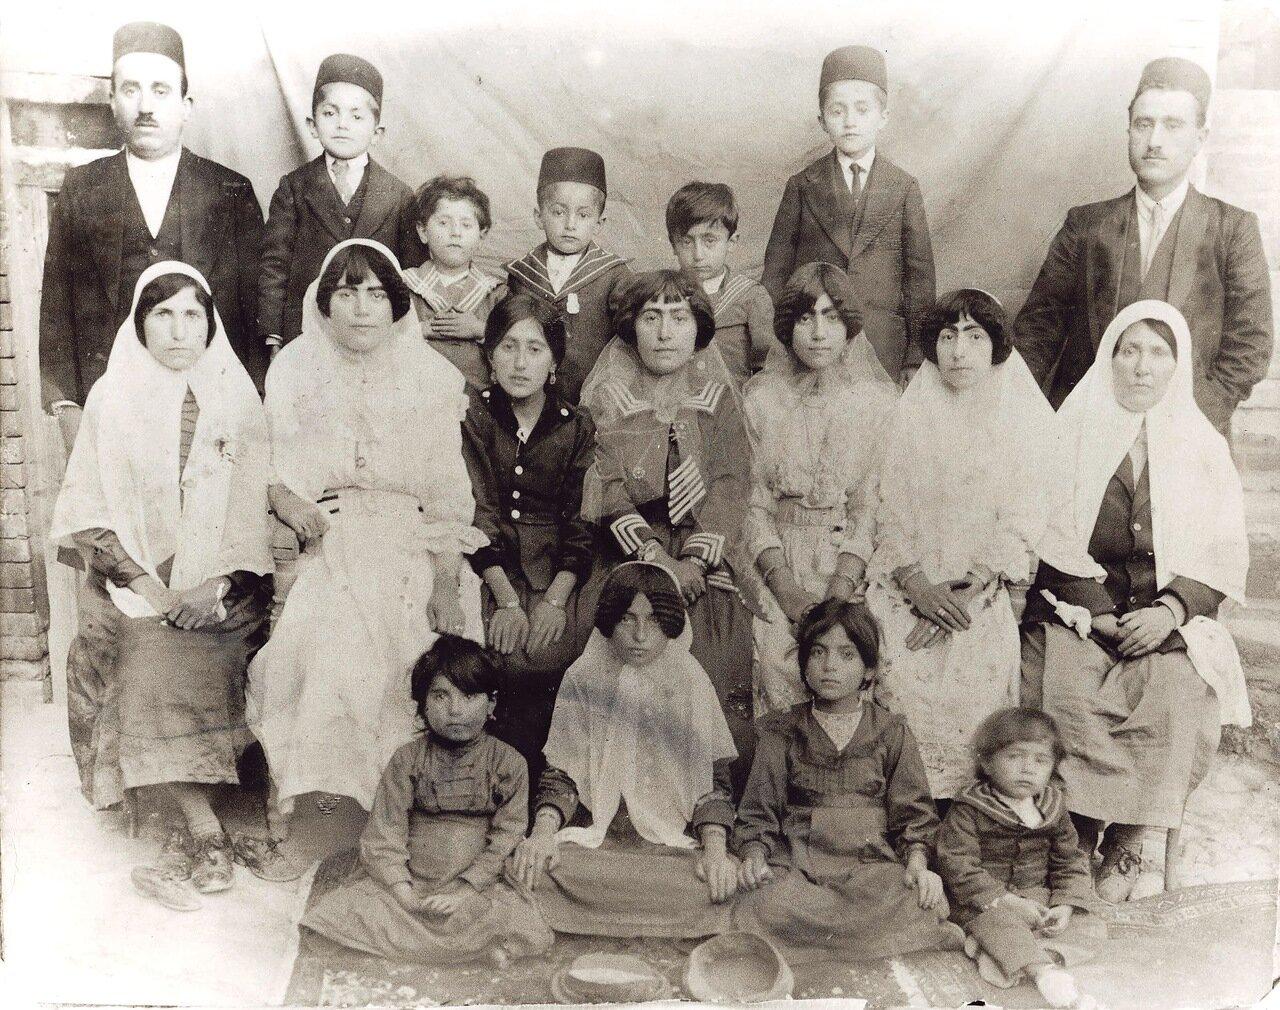 Семья Меира Ага Aзра, Хамадан, ок. 1919